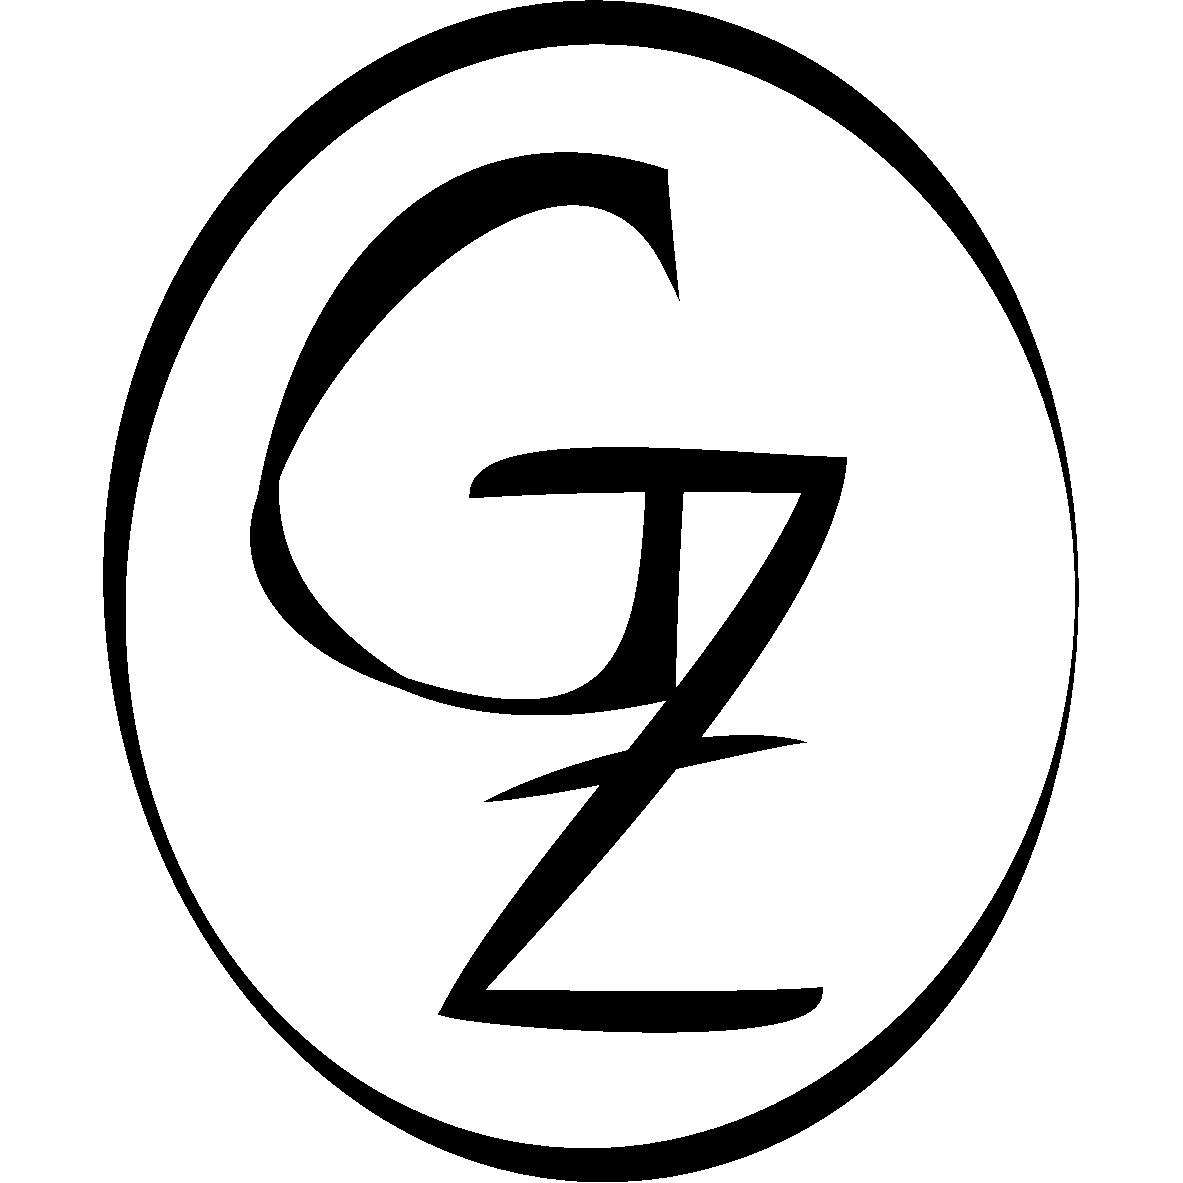 monogrammagzSQ